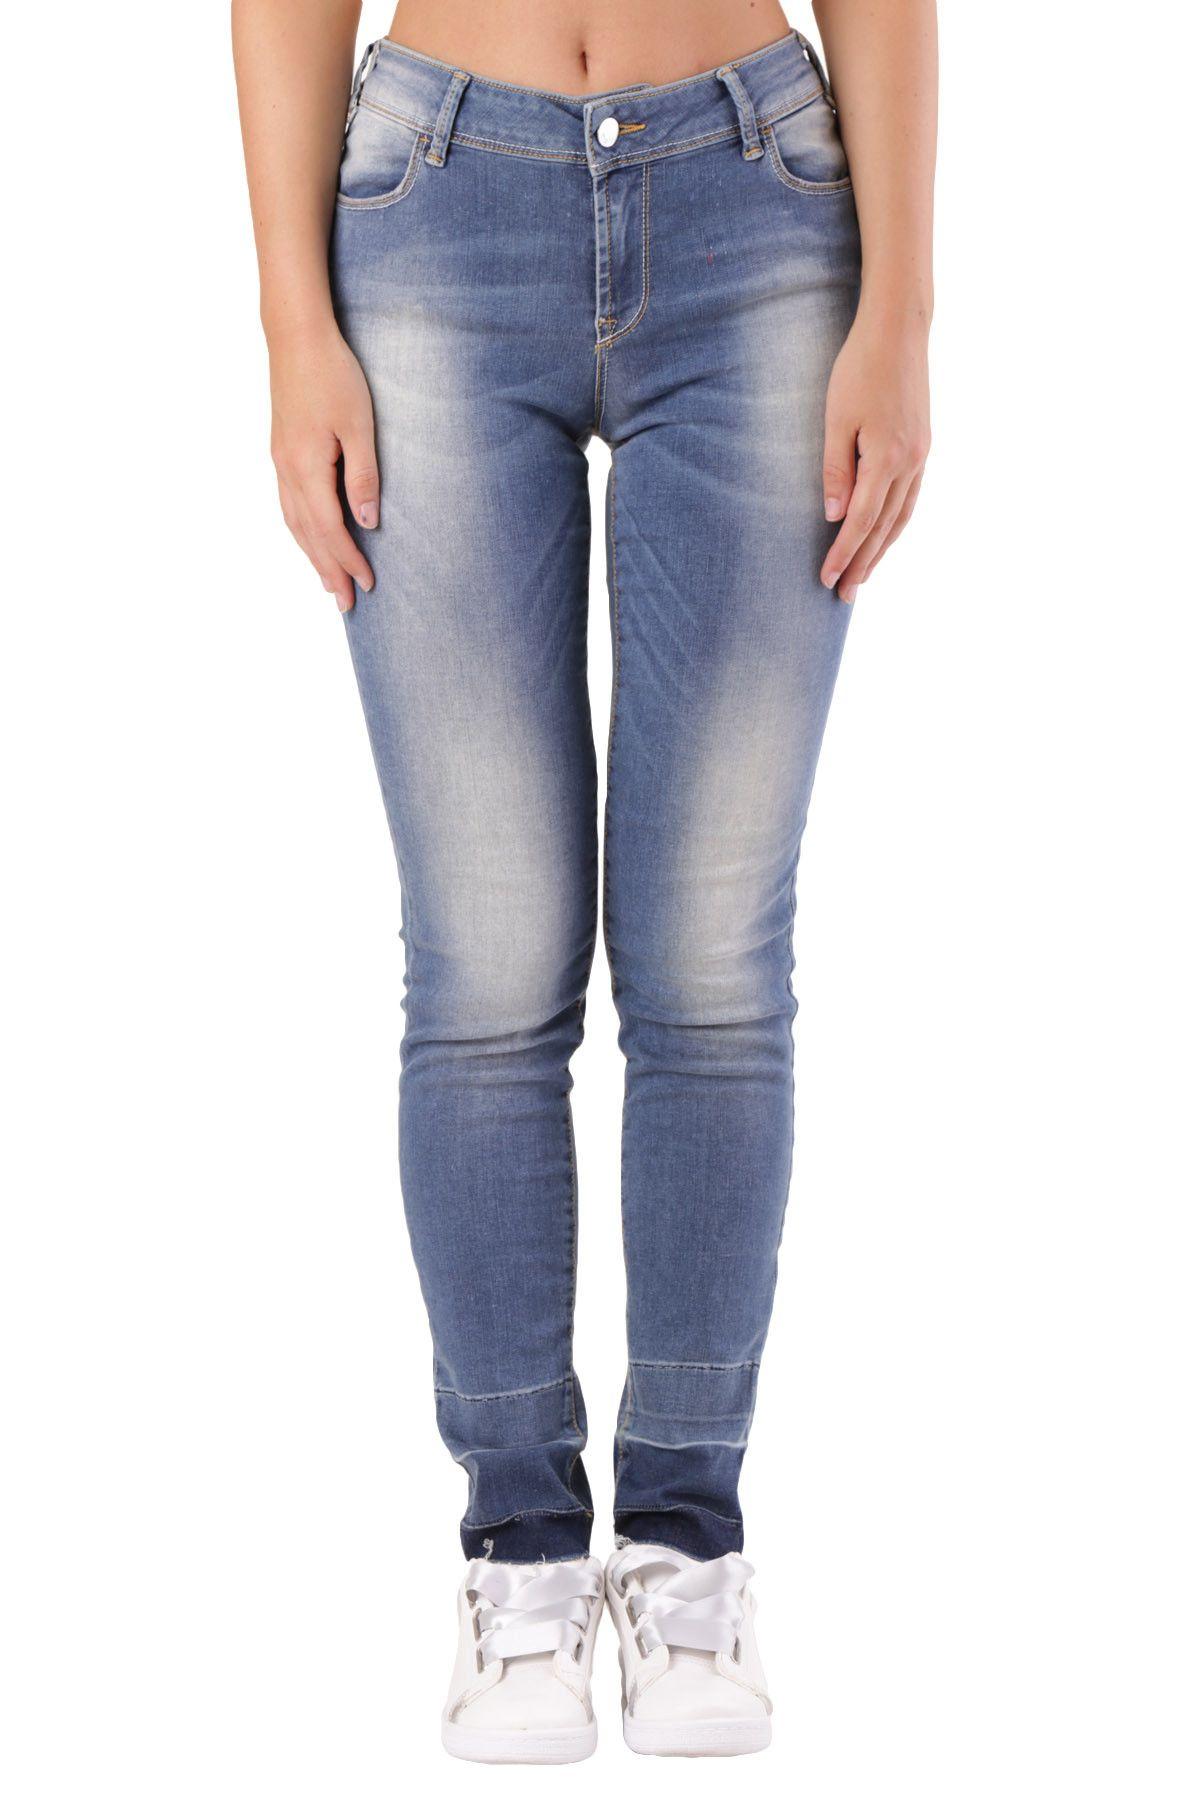 Met Women's Jeans In Blue